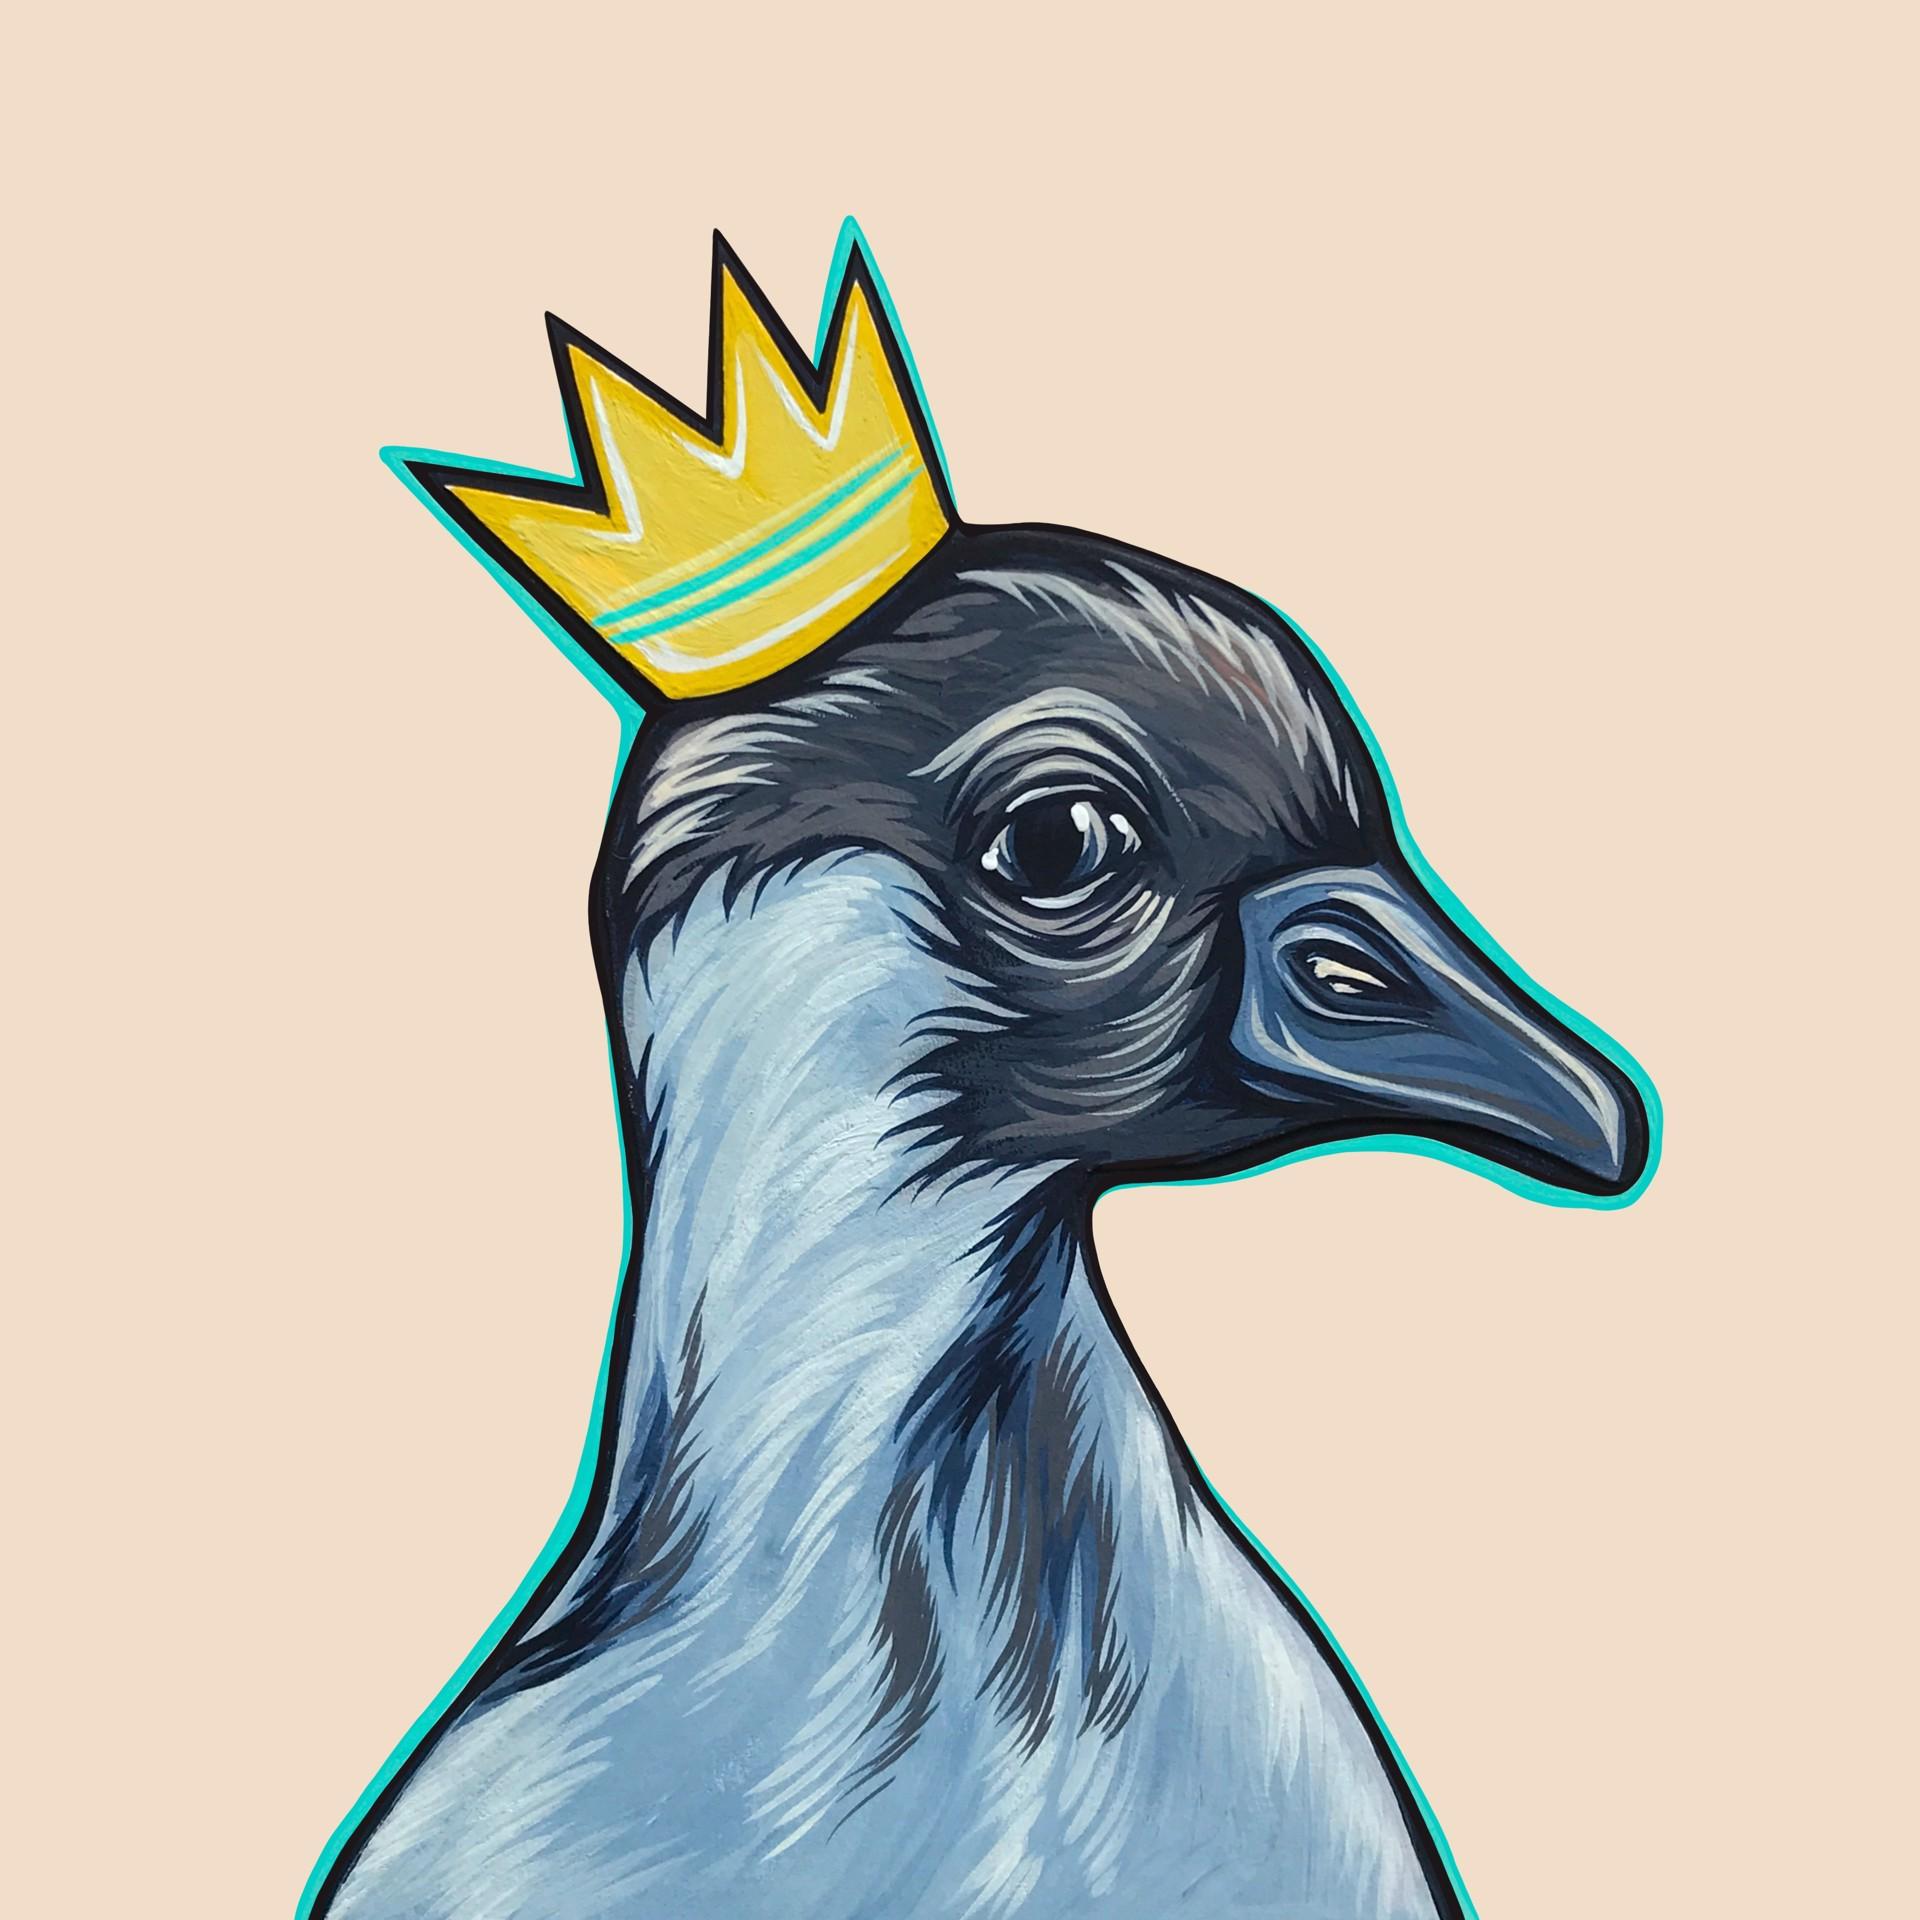 Mighty Ducks Teal Crown by Kaitlin Ziesmer